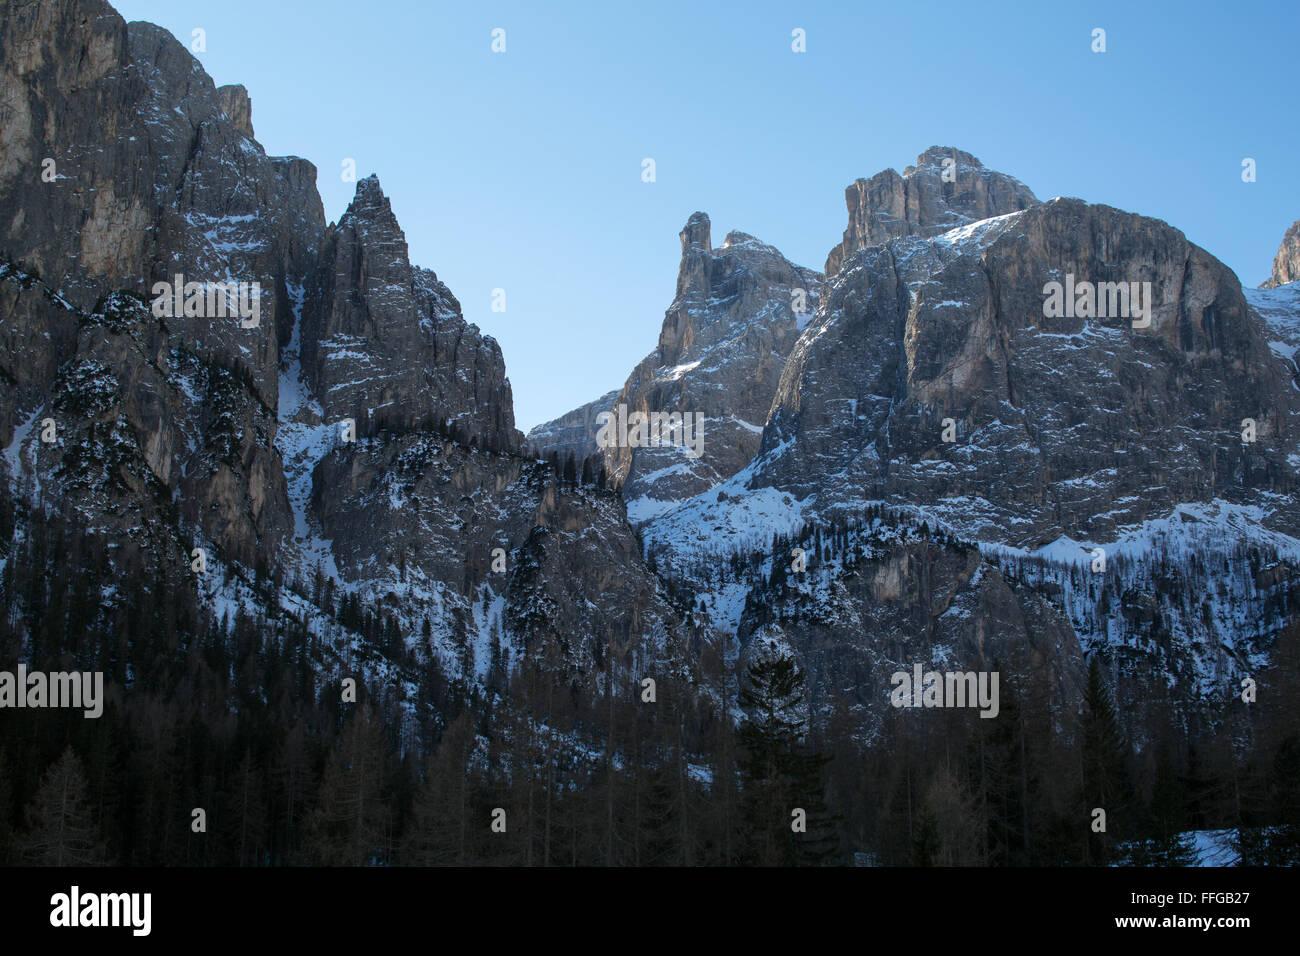 The mountain peaks of Sella Ronda near Corvara, Alta Badia, Dolomites, Belluno, Italy - Stock Image